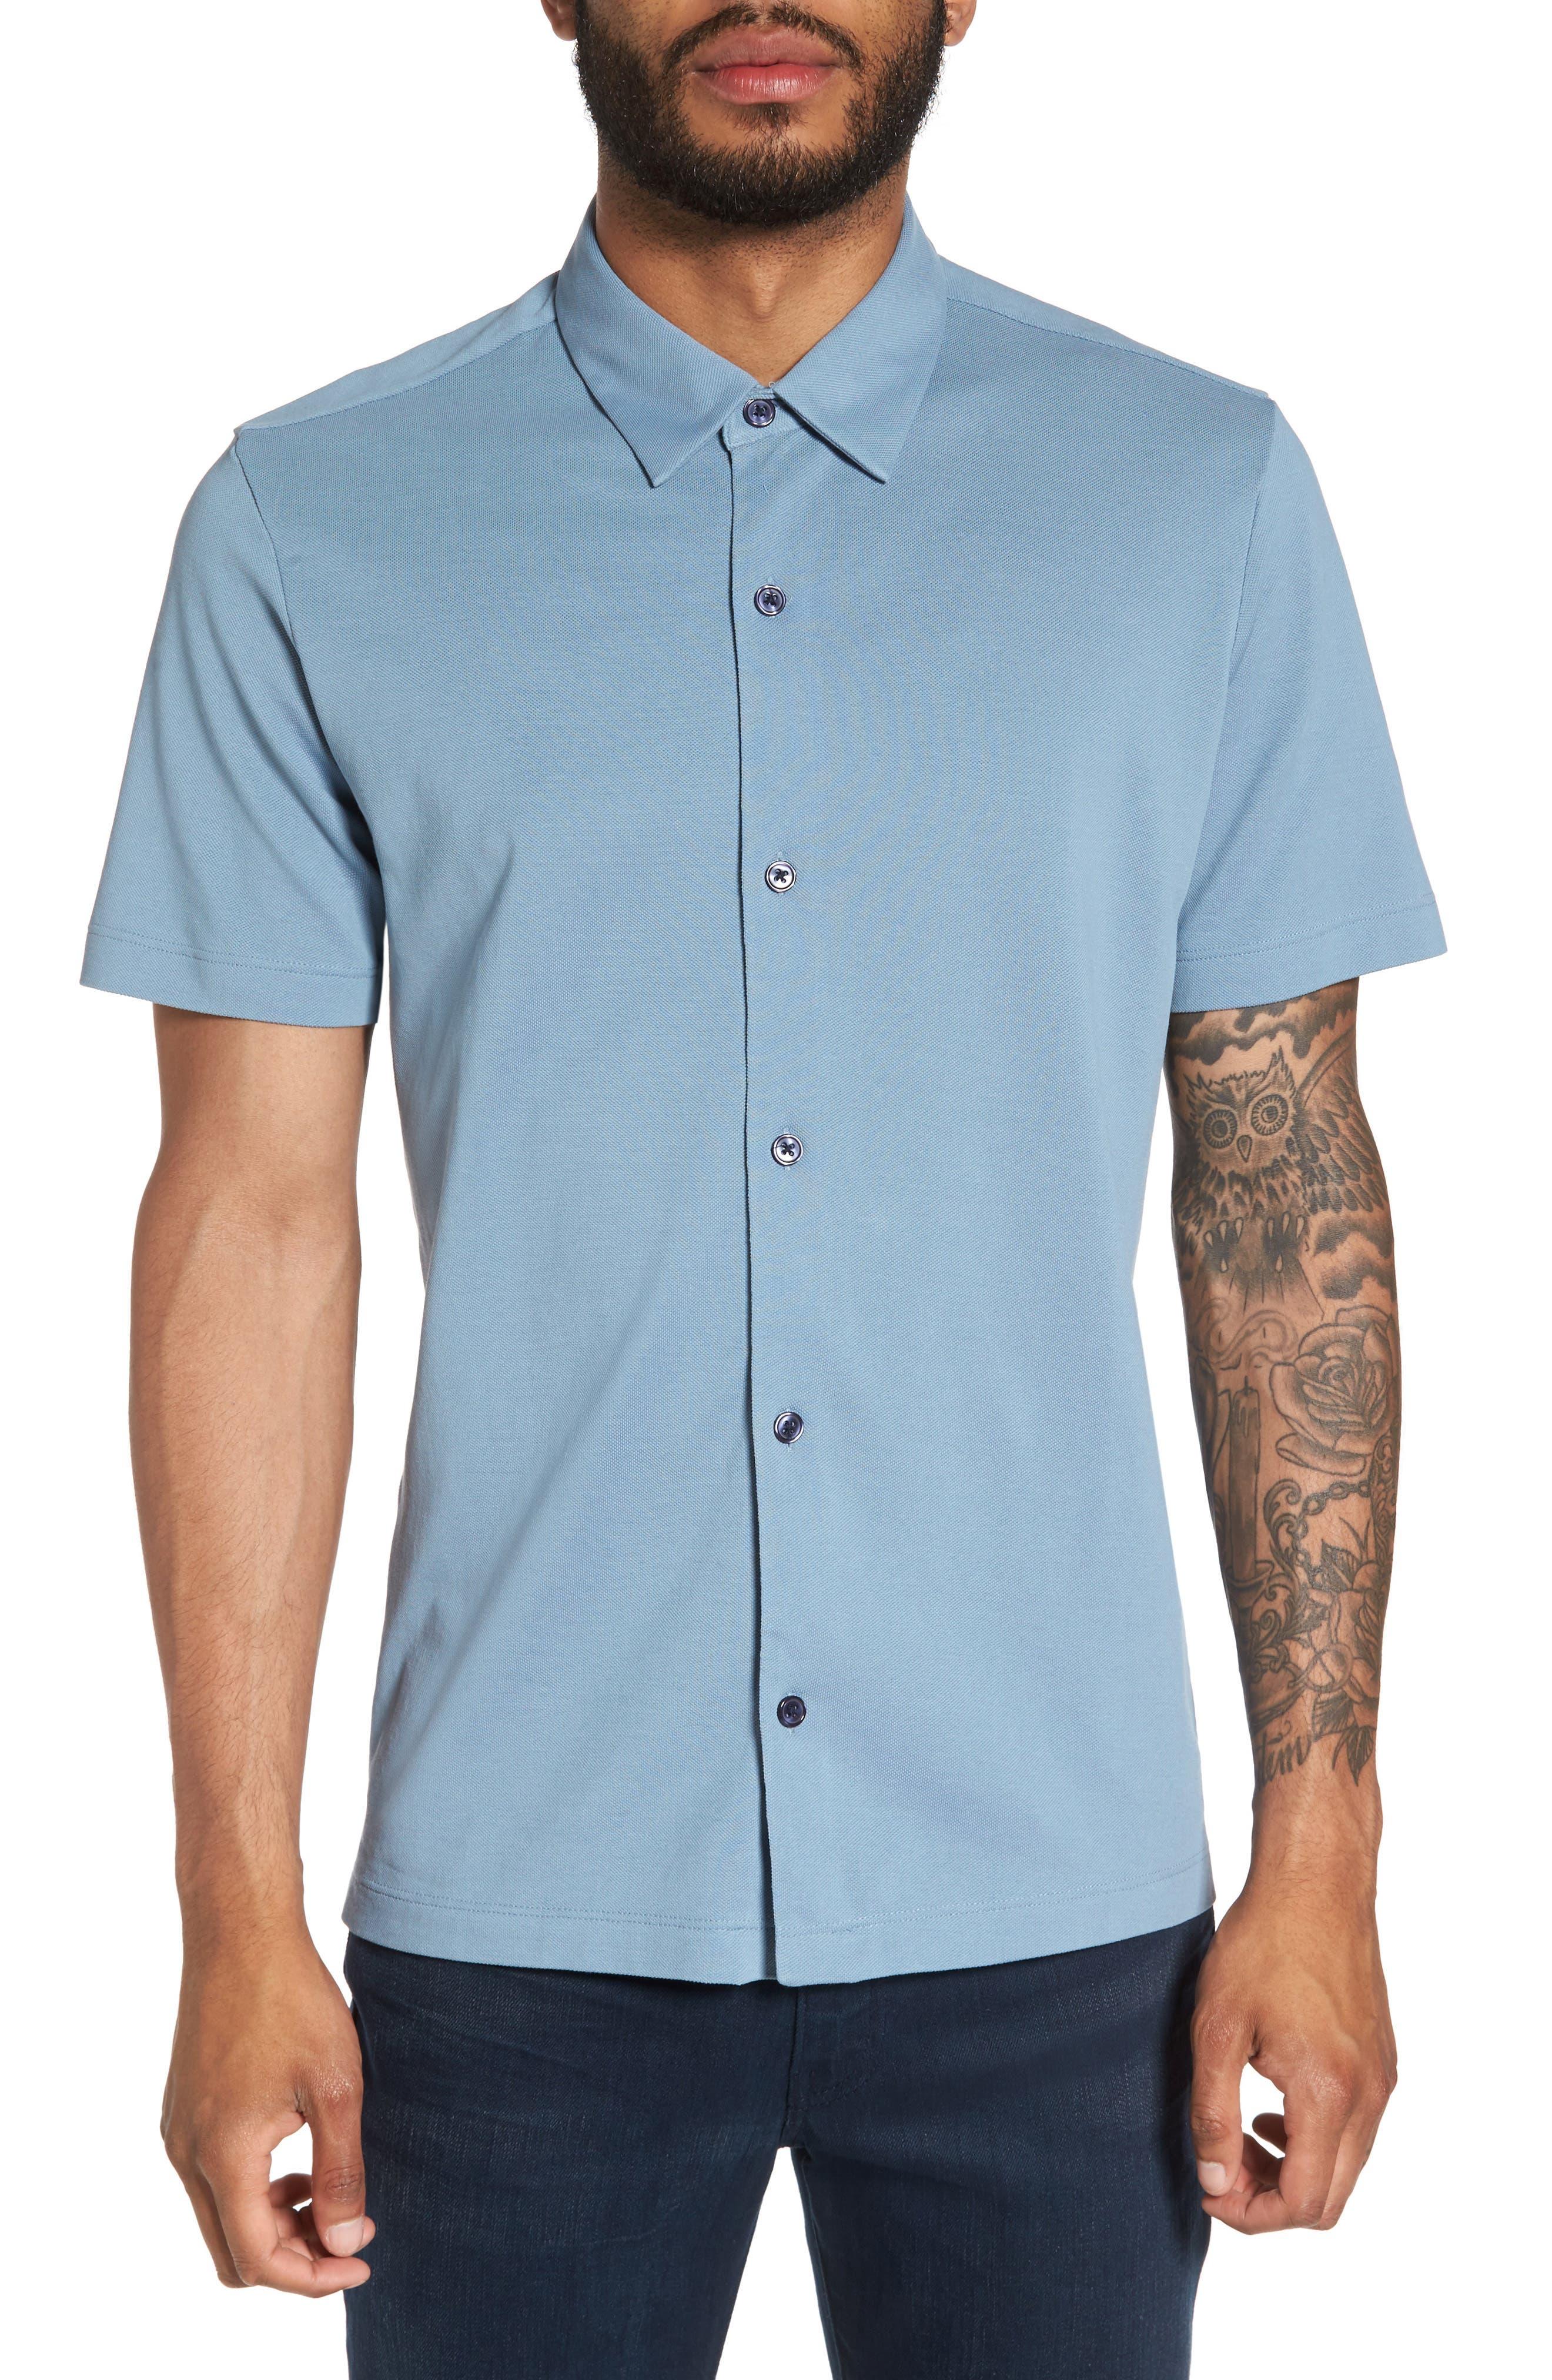 THEORY Slim Fit Air Piqué Sport Shirt